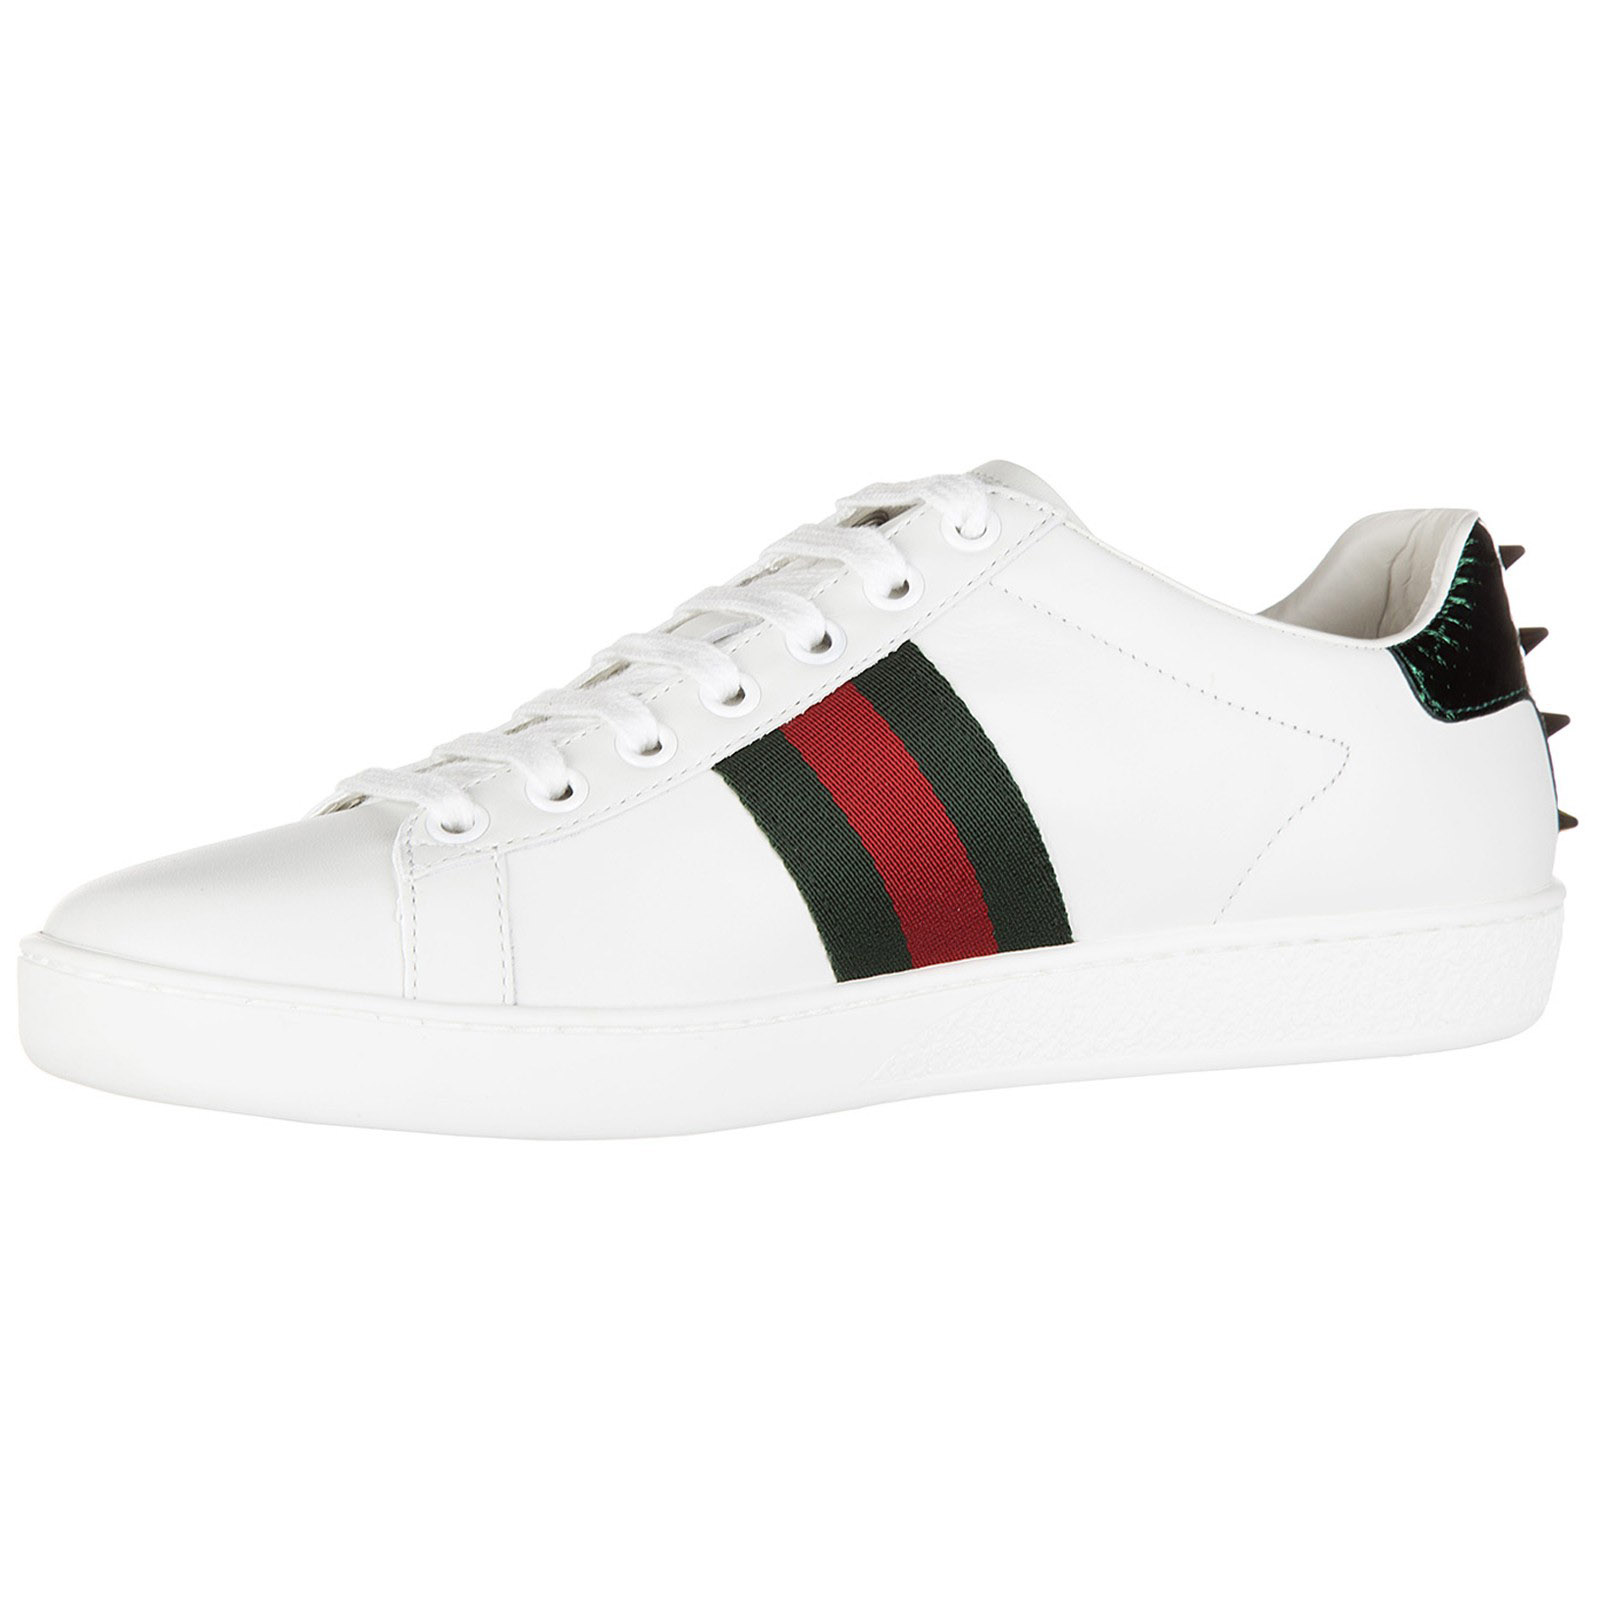 e2071363471 ... Chaussures baskets sneakers femme en cuir mirò soft ace ...